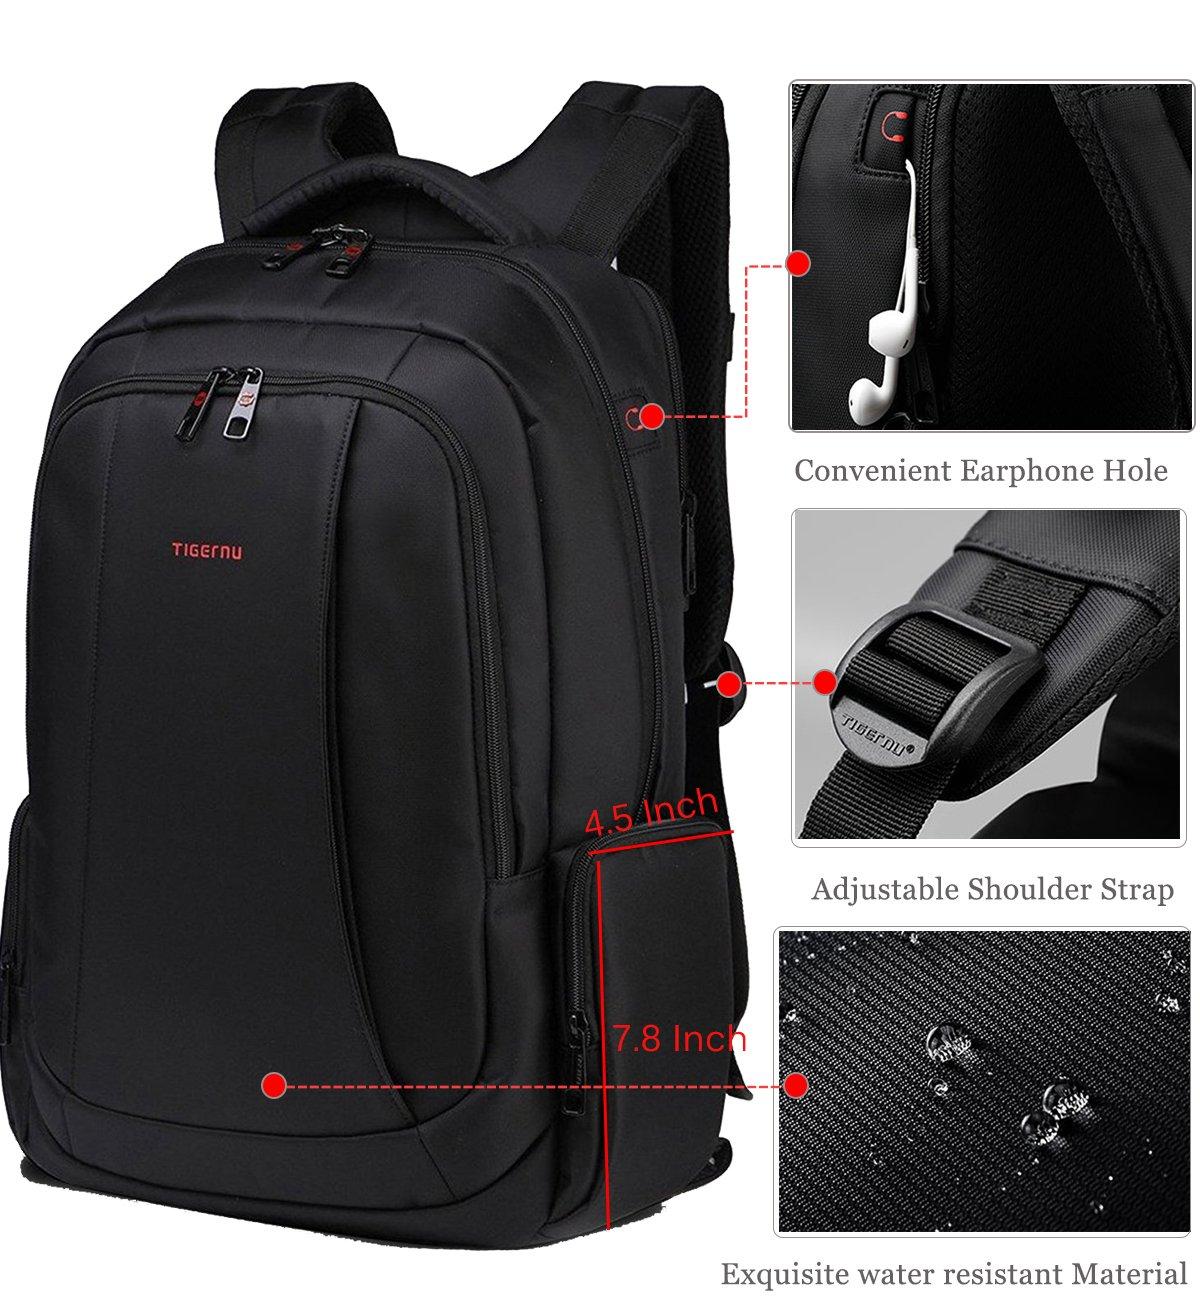 Diy laptop backpack - Fubevod Laptop Backpack 15 6 Waterproof Business Rucksack With Hidden Pocket Black Amazon Co Uk Luggage